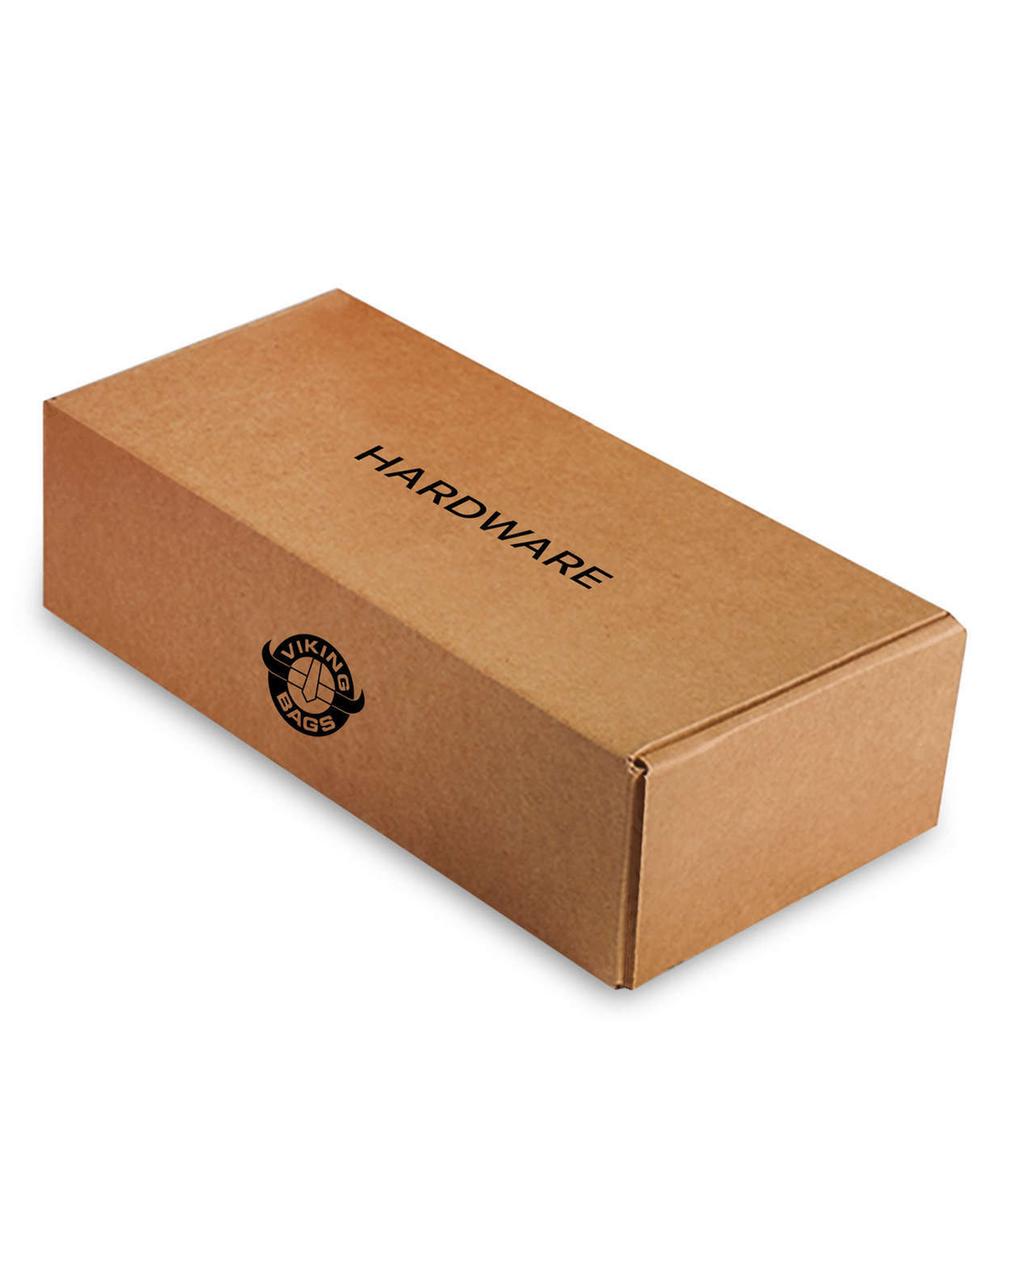 Victory Boardwalk Charger Slanted Medium Motorcycle Saddlebags Hardware Box